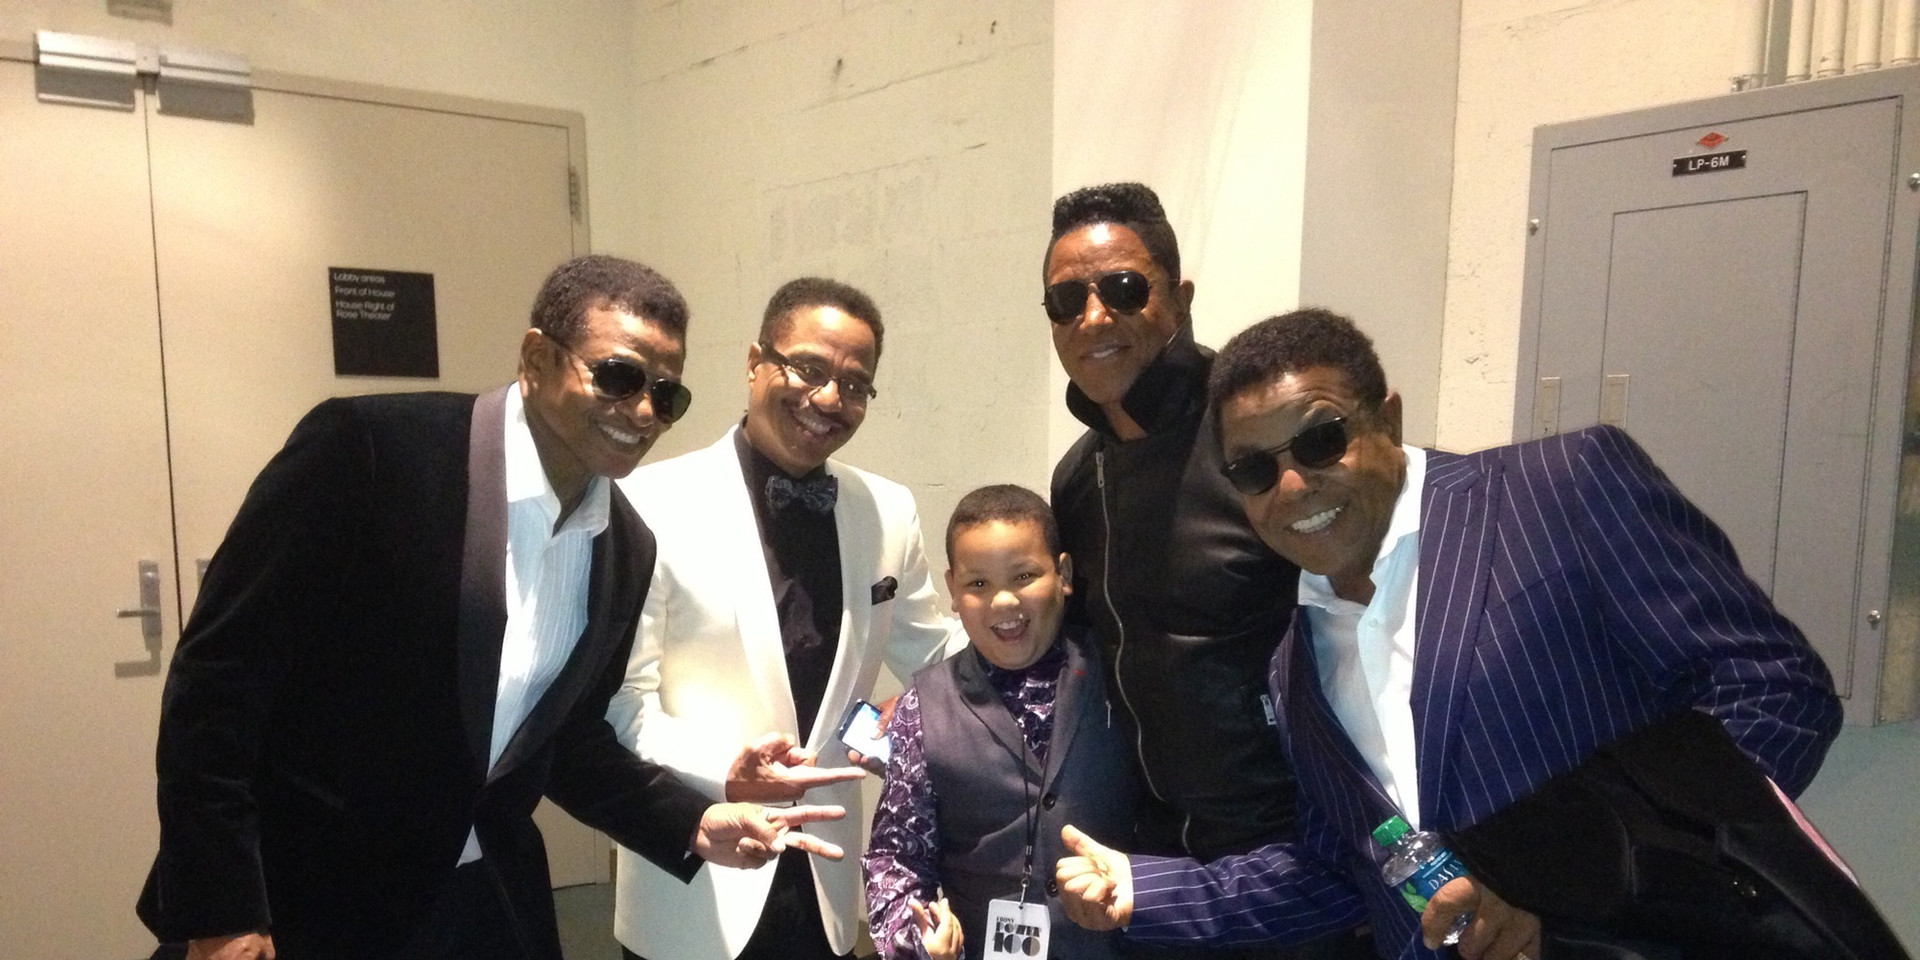 Joshua & The Jacksons